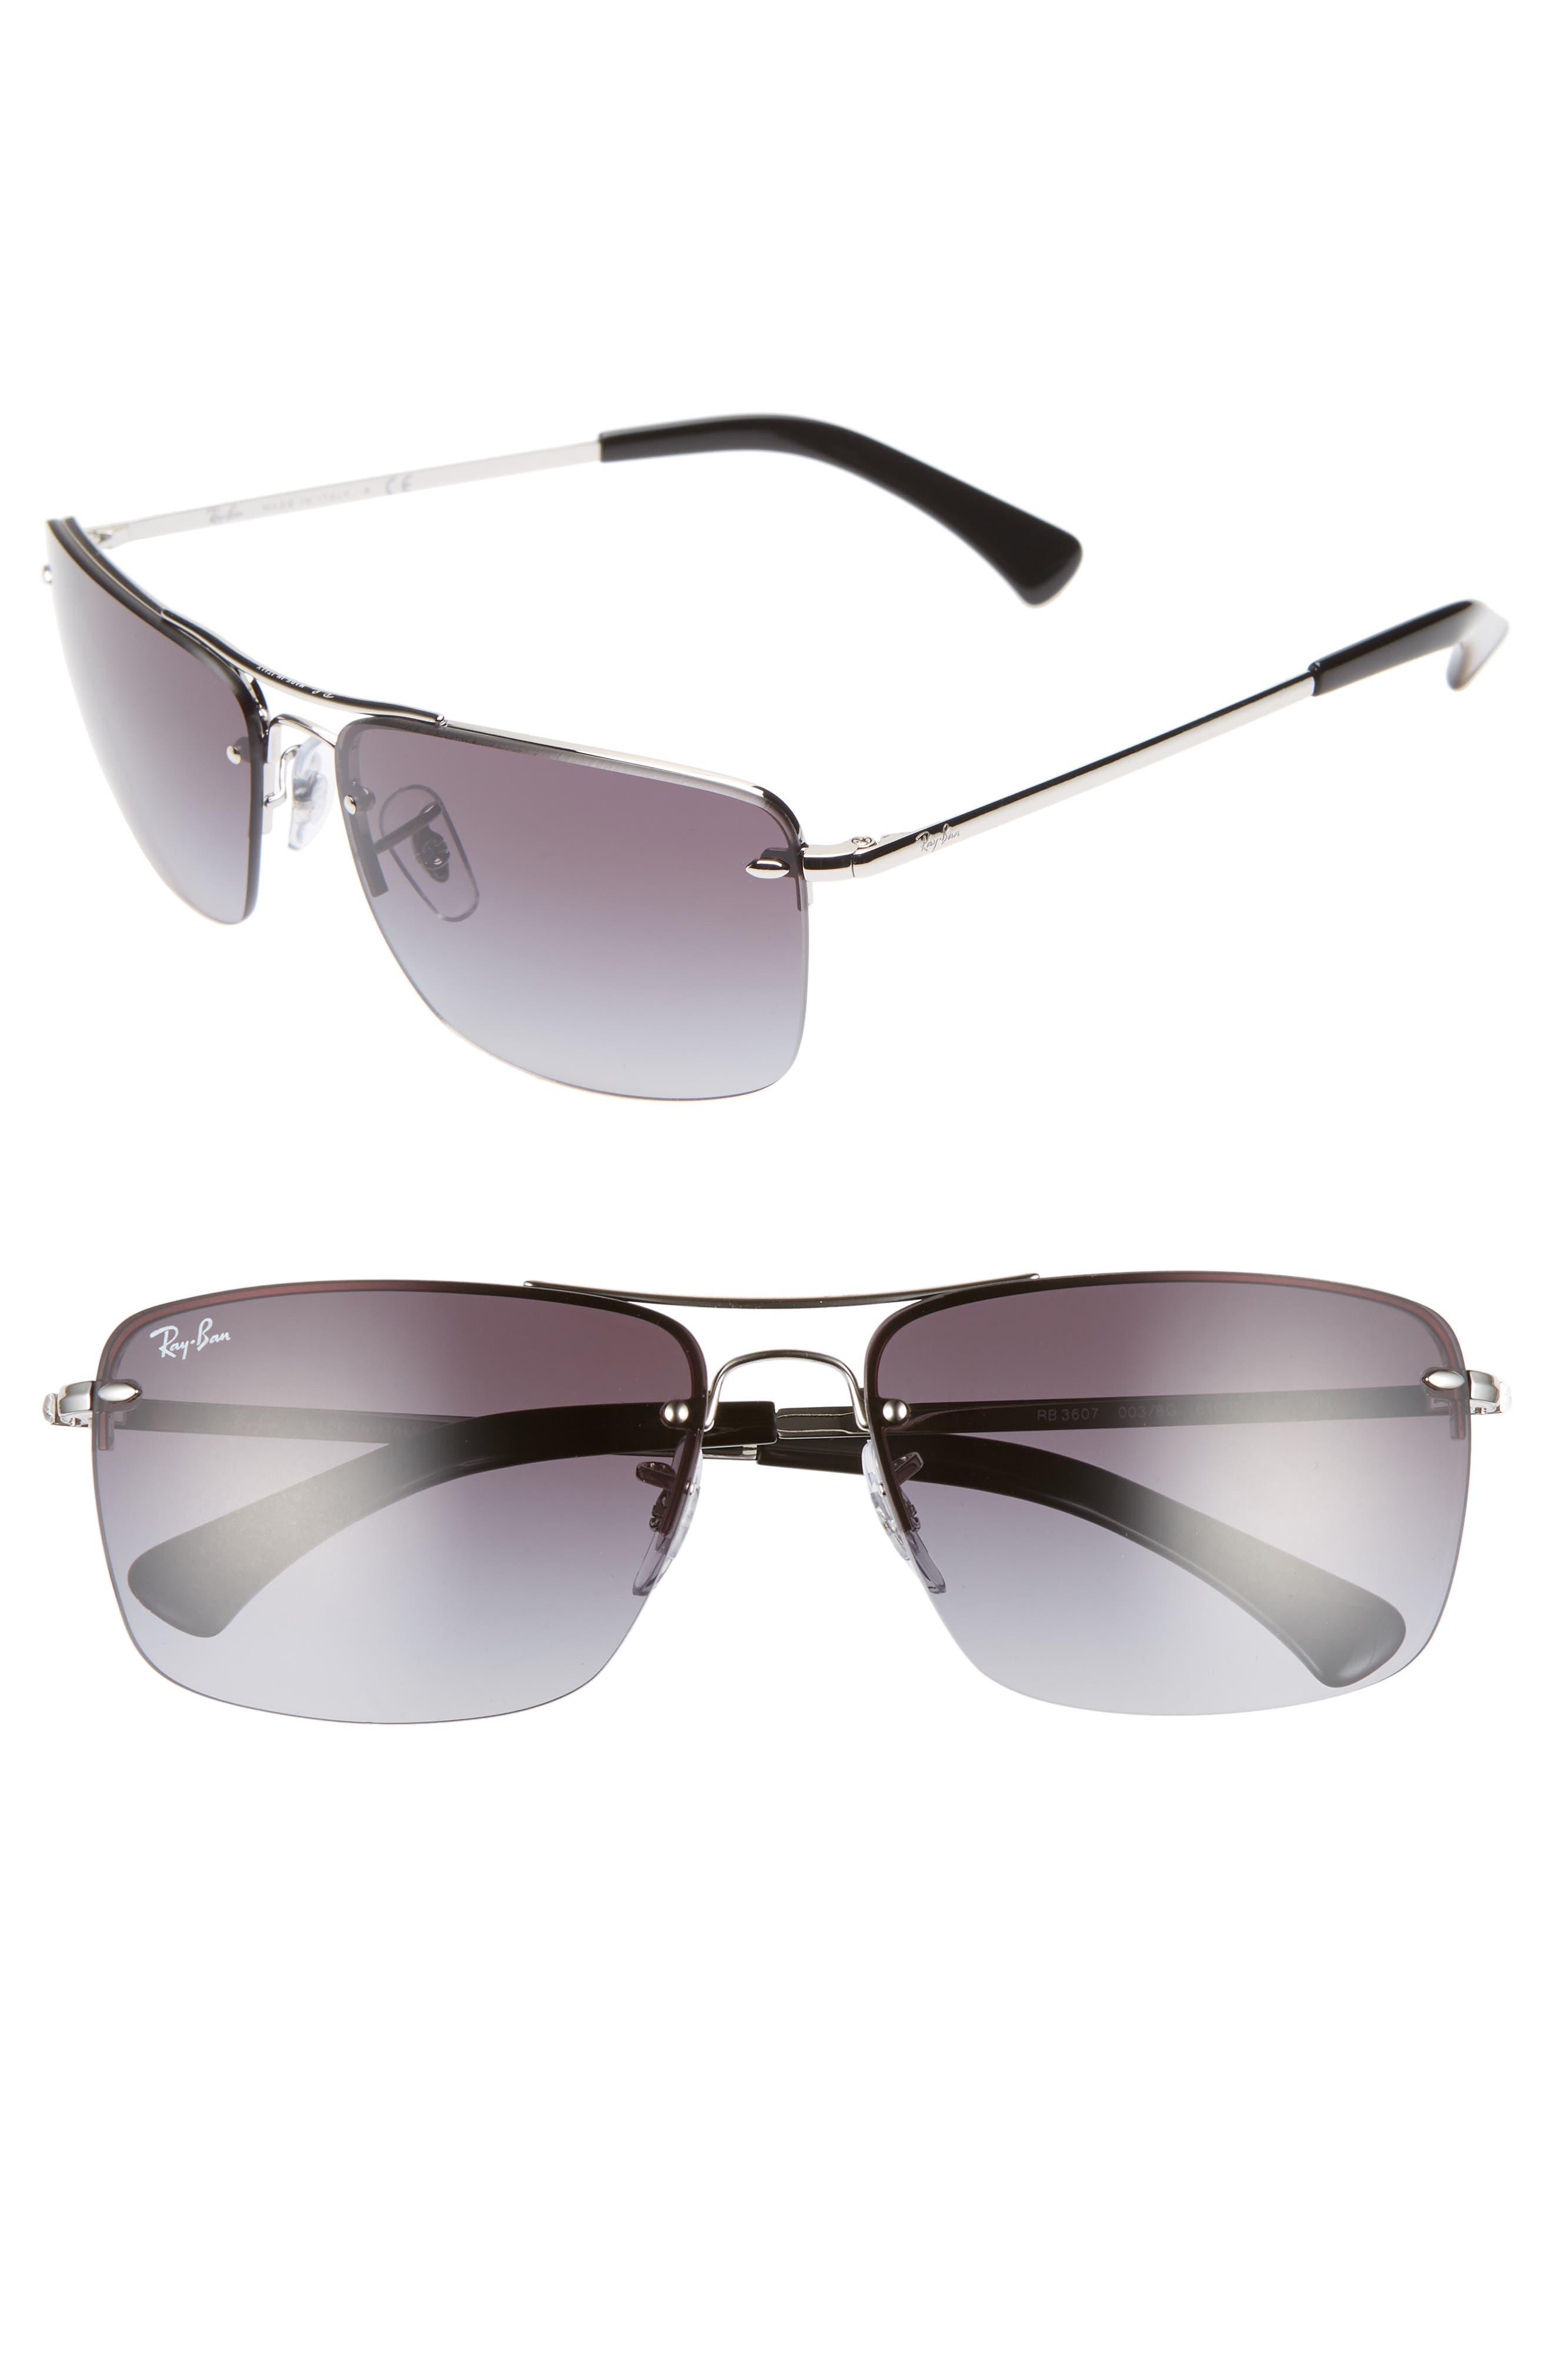 61mm Gradient Semi Rimless Navigator Sunglasses by Ray Ban